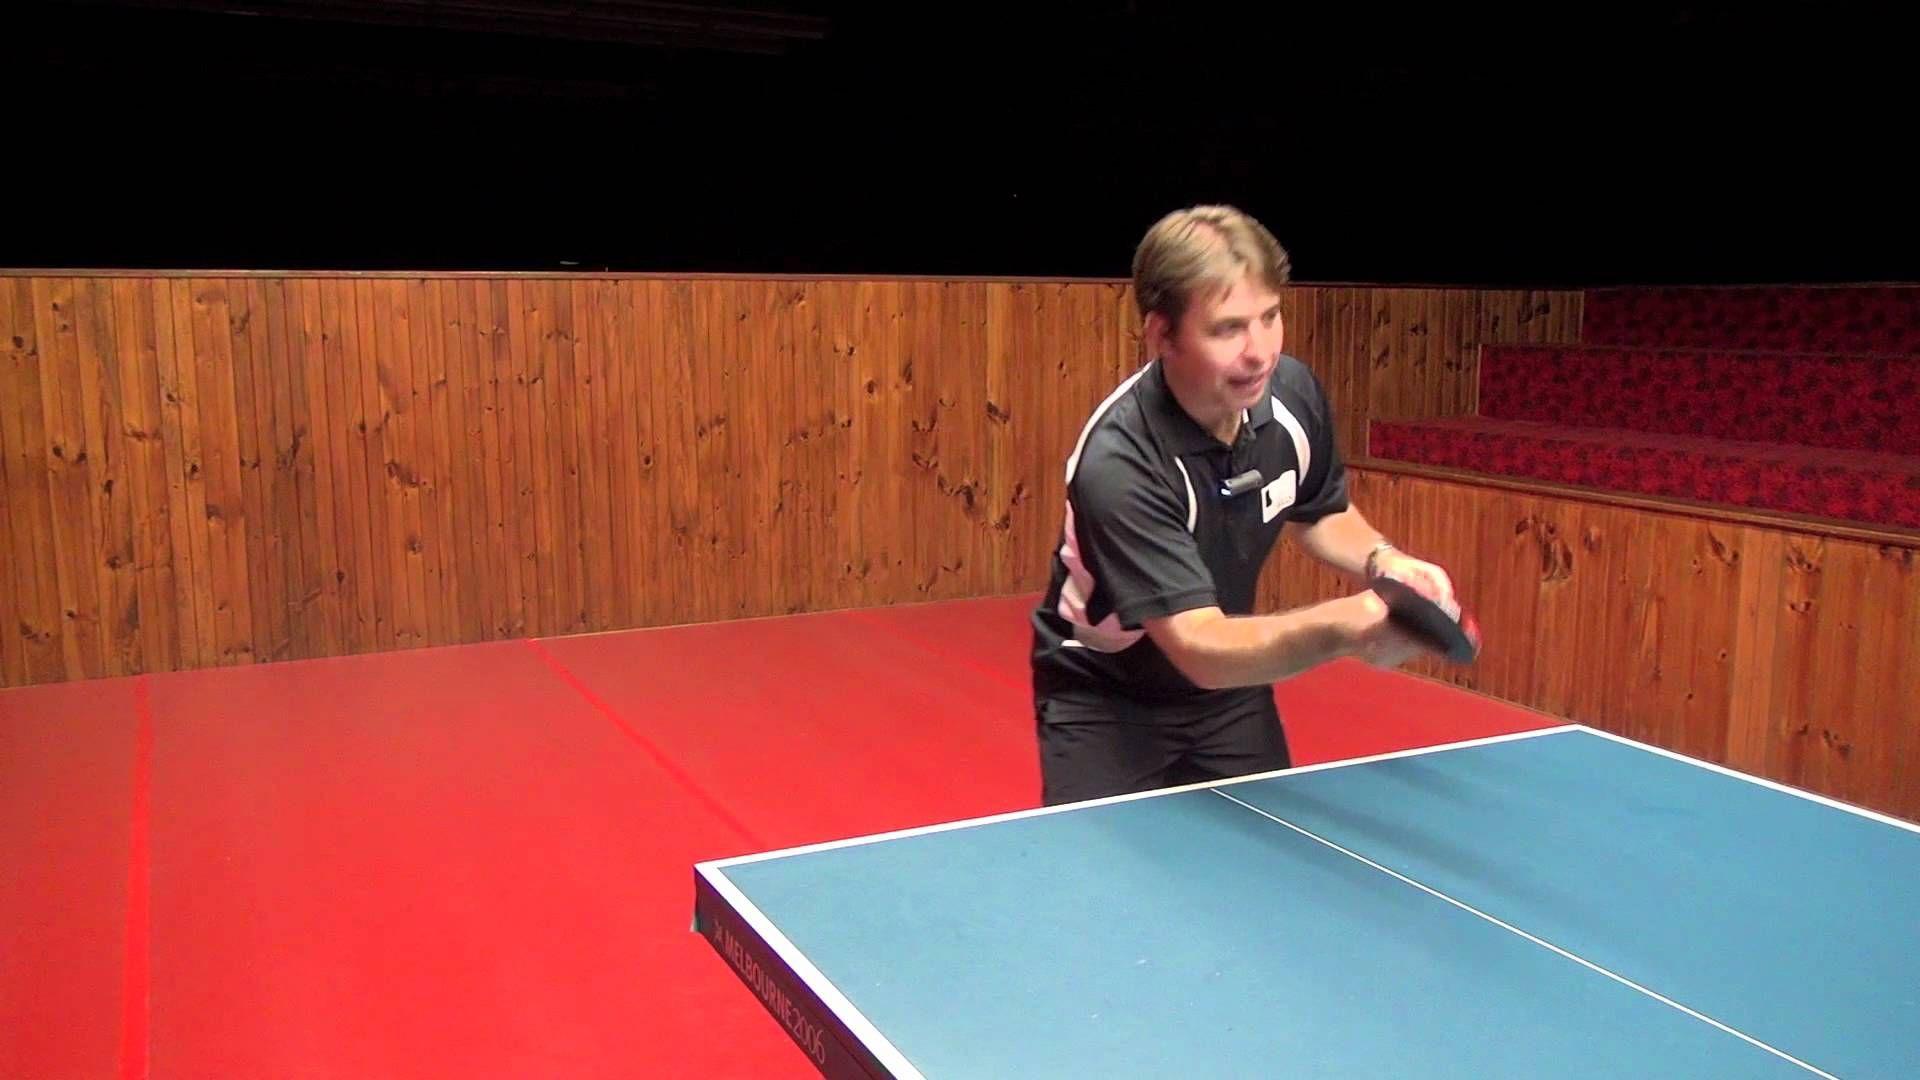 Forehand Push In Table Tennis Table Tennis Tennis Tennis Tips